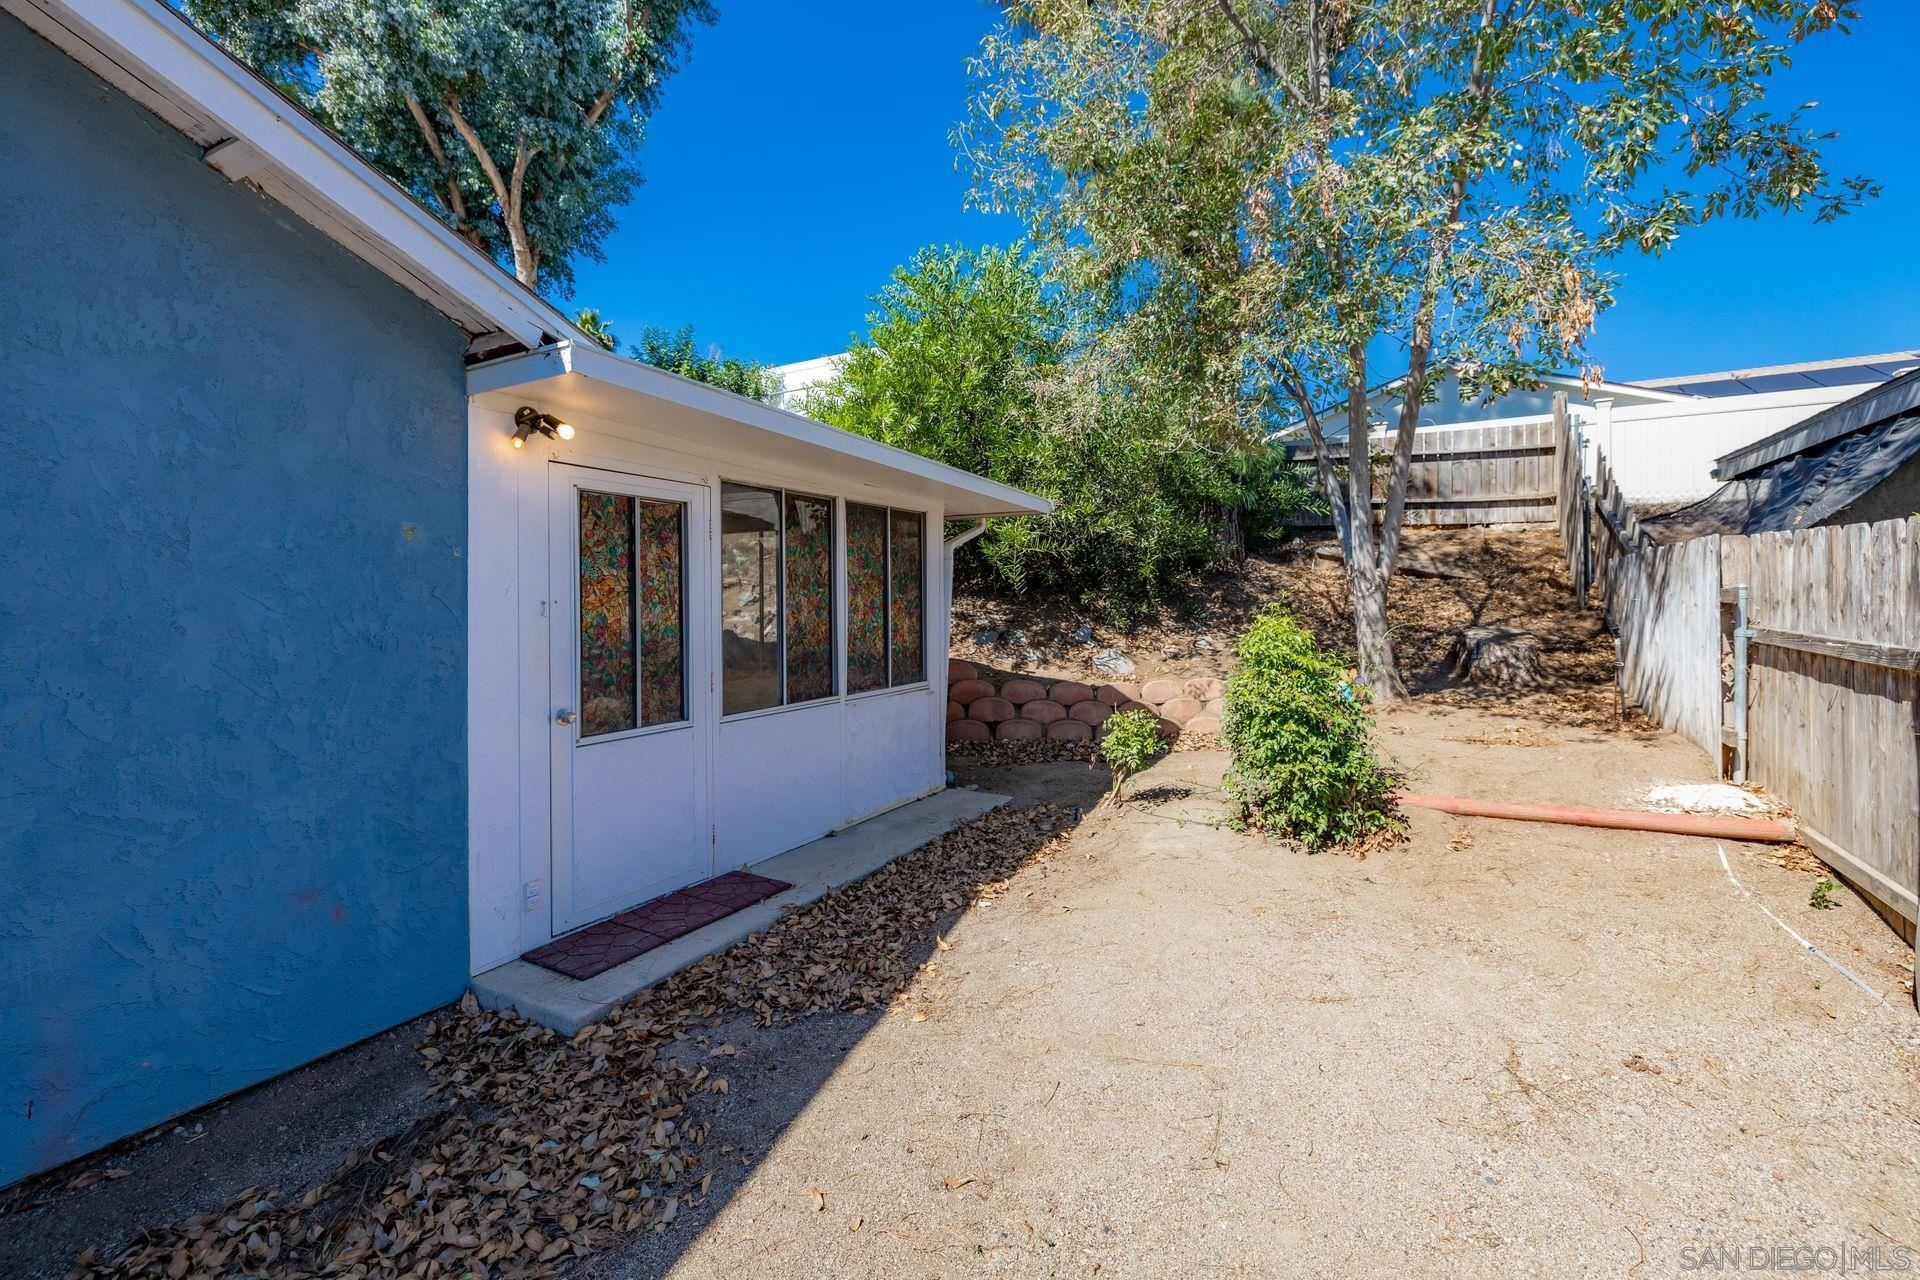 Photo of 13880 Olive Mill Way, Poway, CA 92064 (MLS # 210029212)